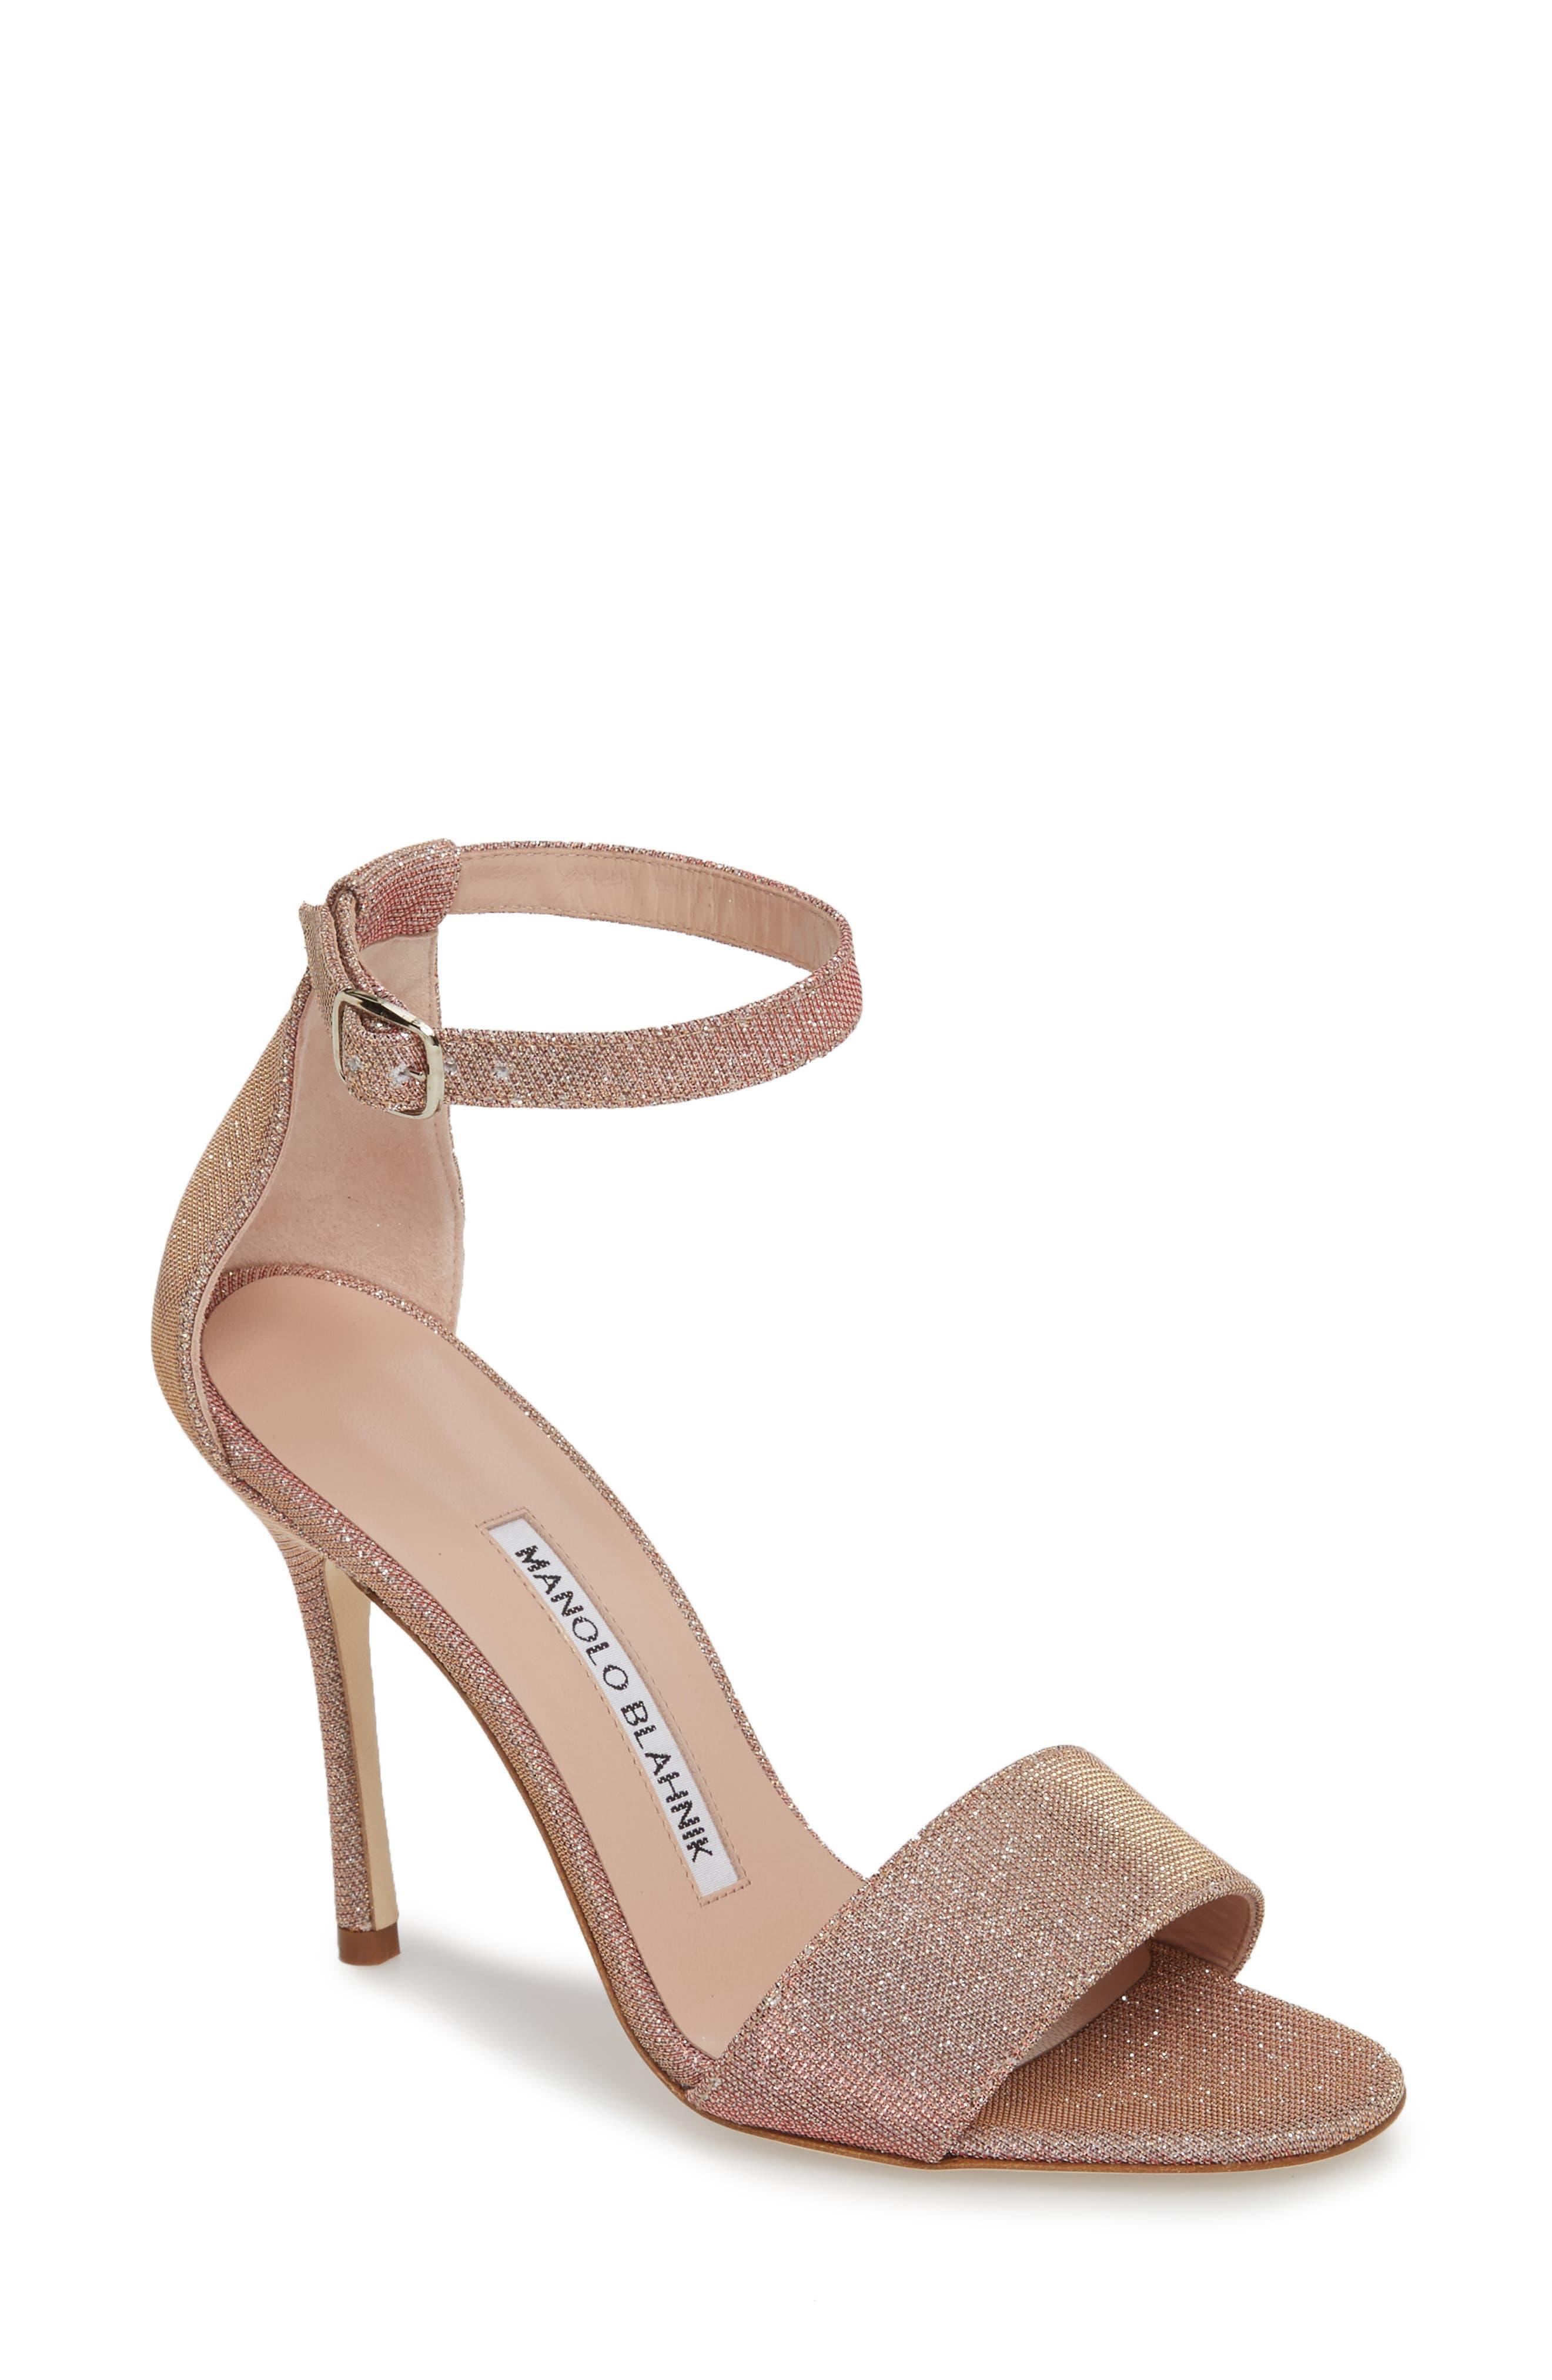 Tres Ankle Strap Sandal,                         Main,                         color, Champagne Notturno